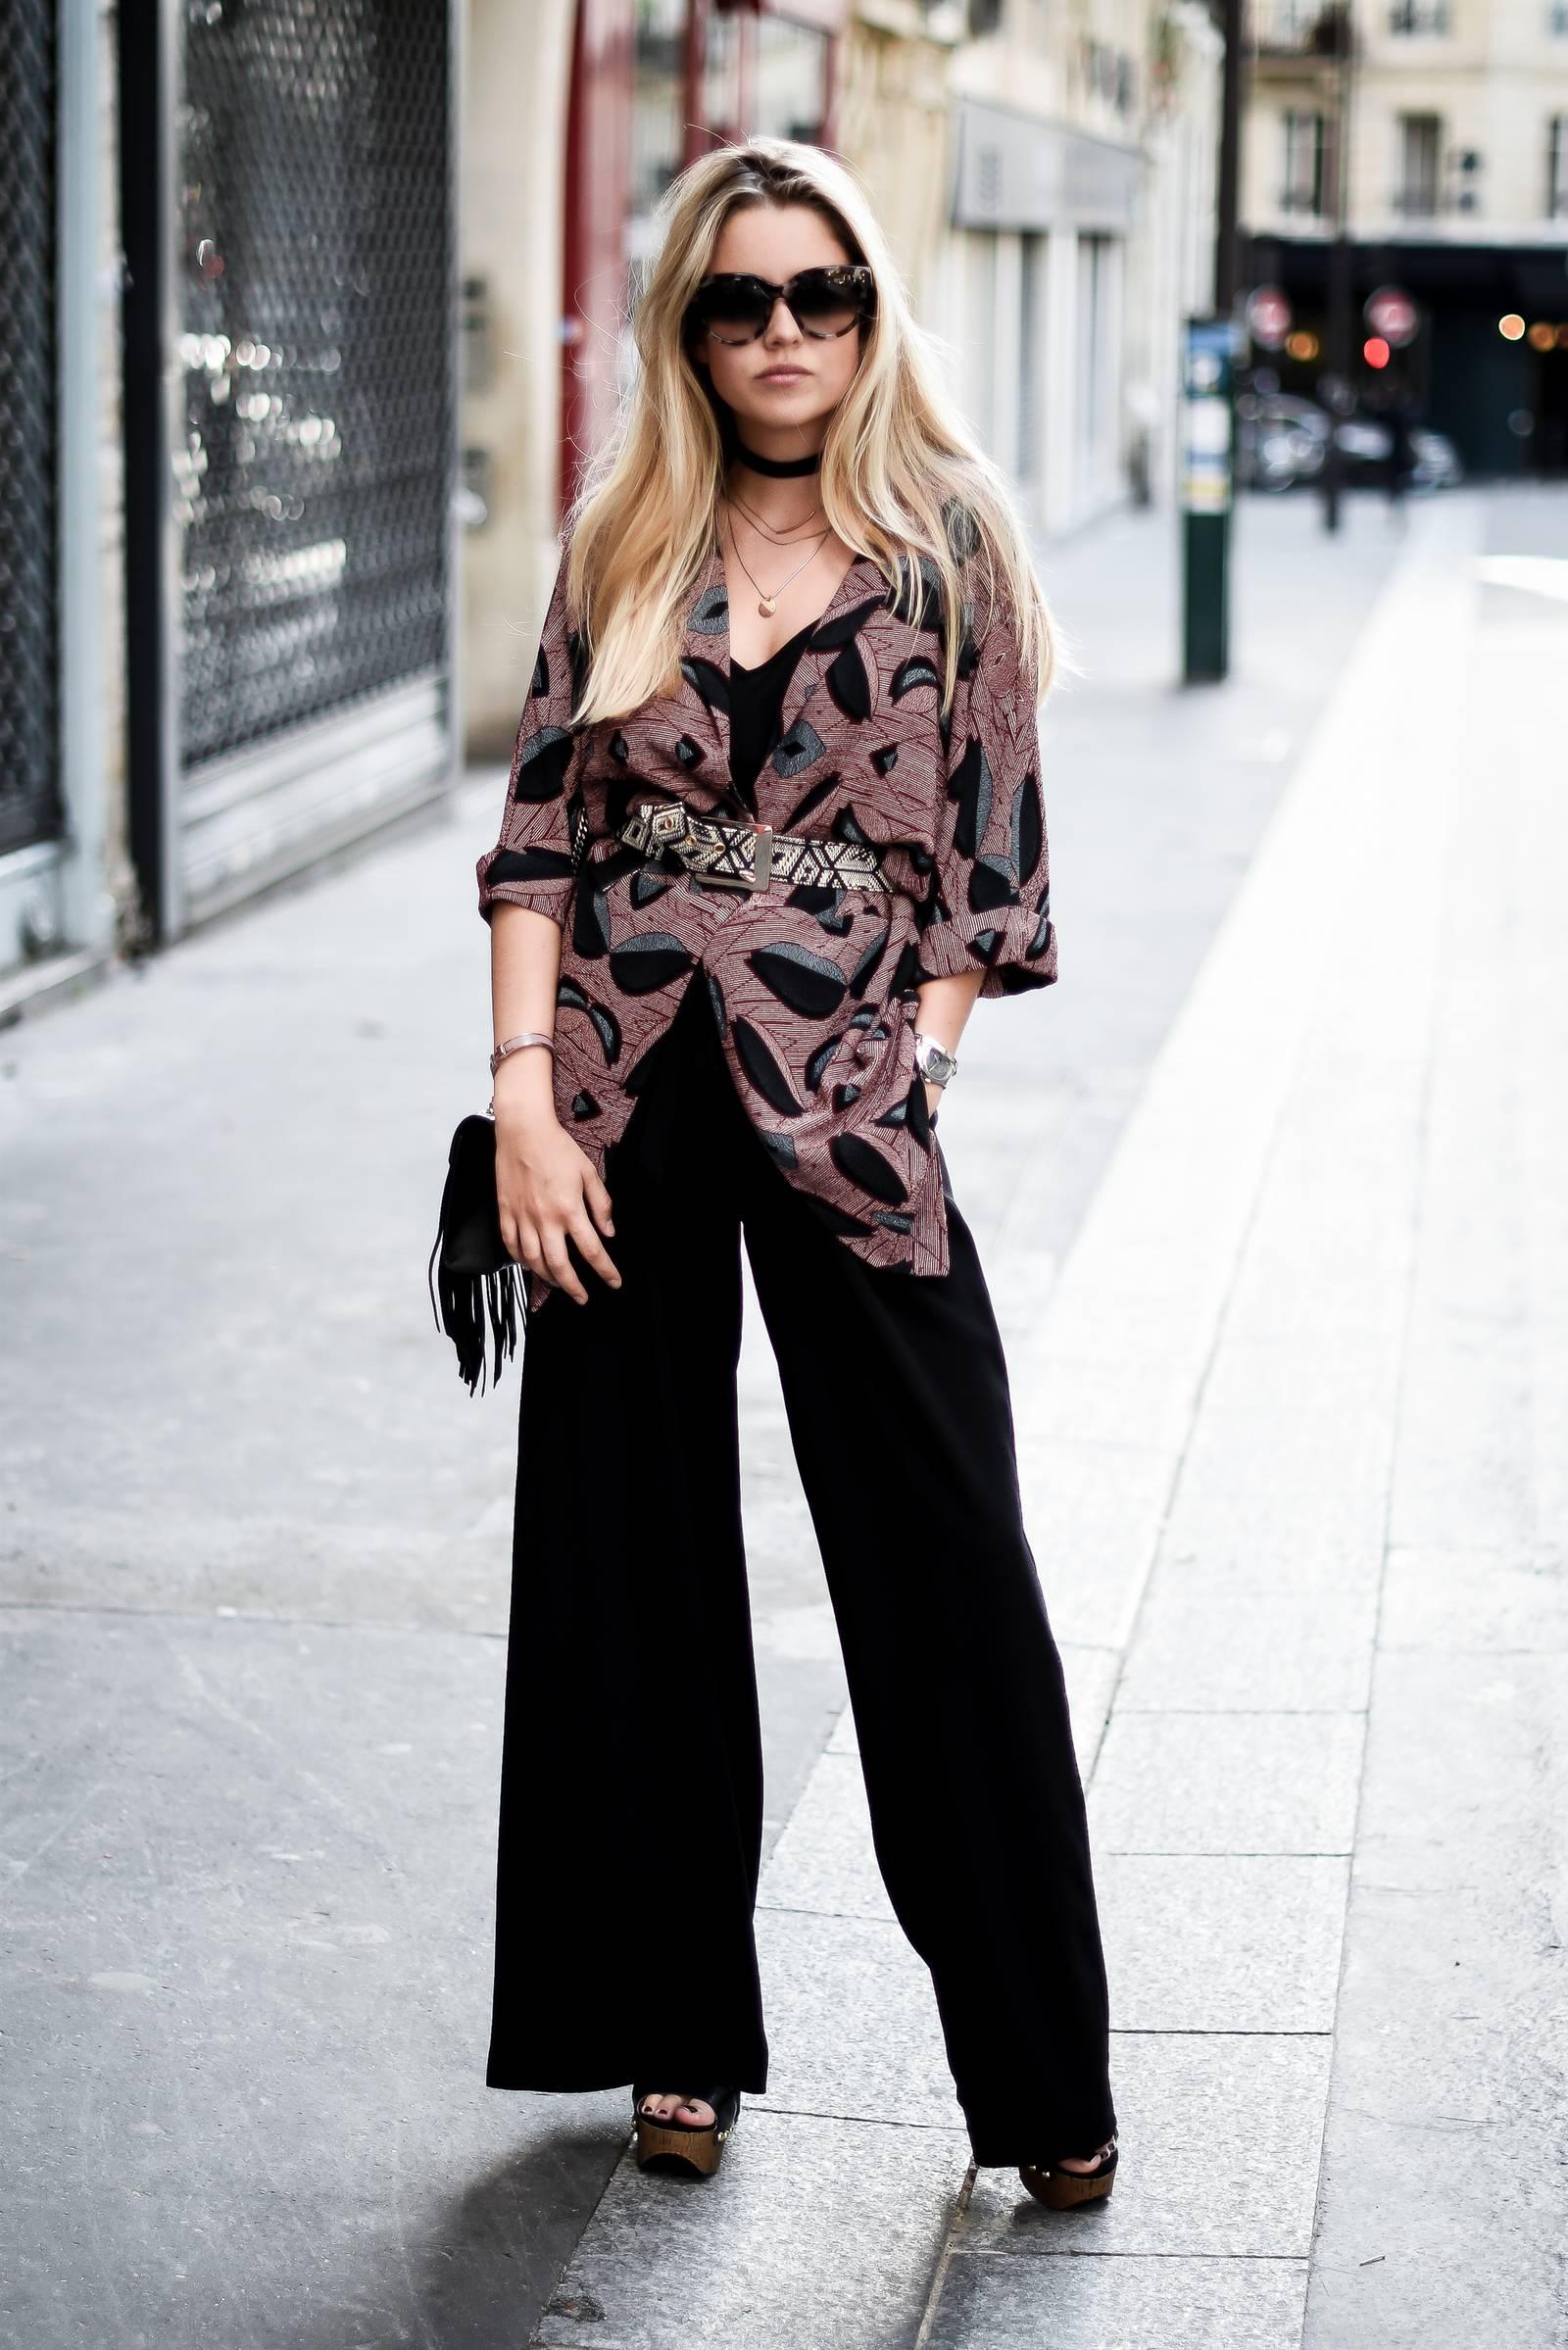 blog mode - Comment s'habiller pour aller au restaurant 2